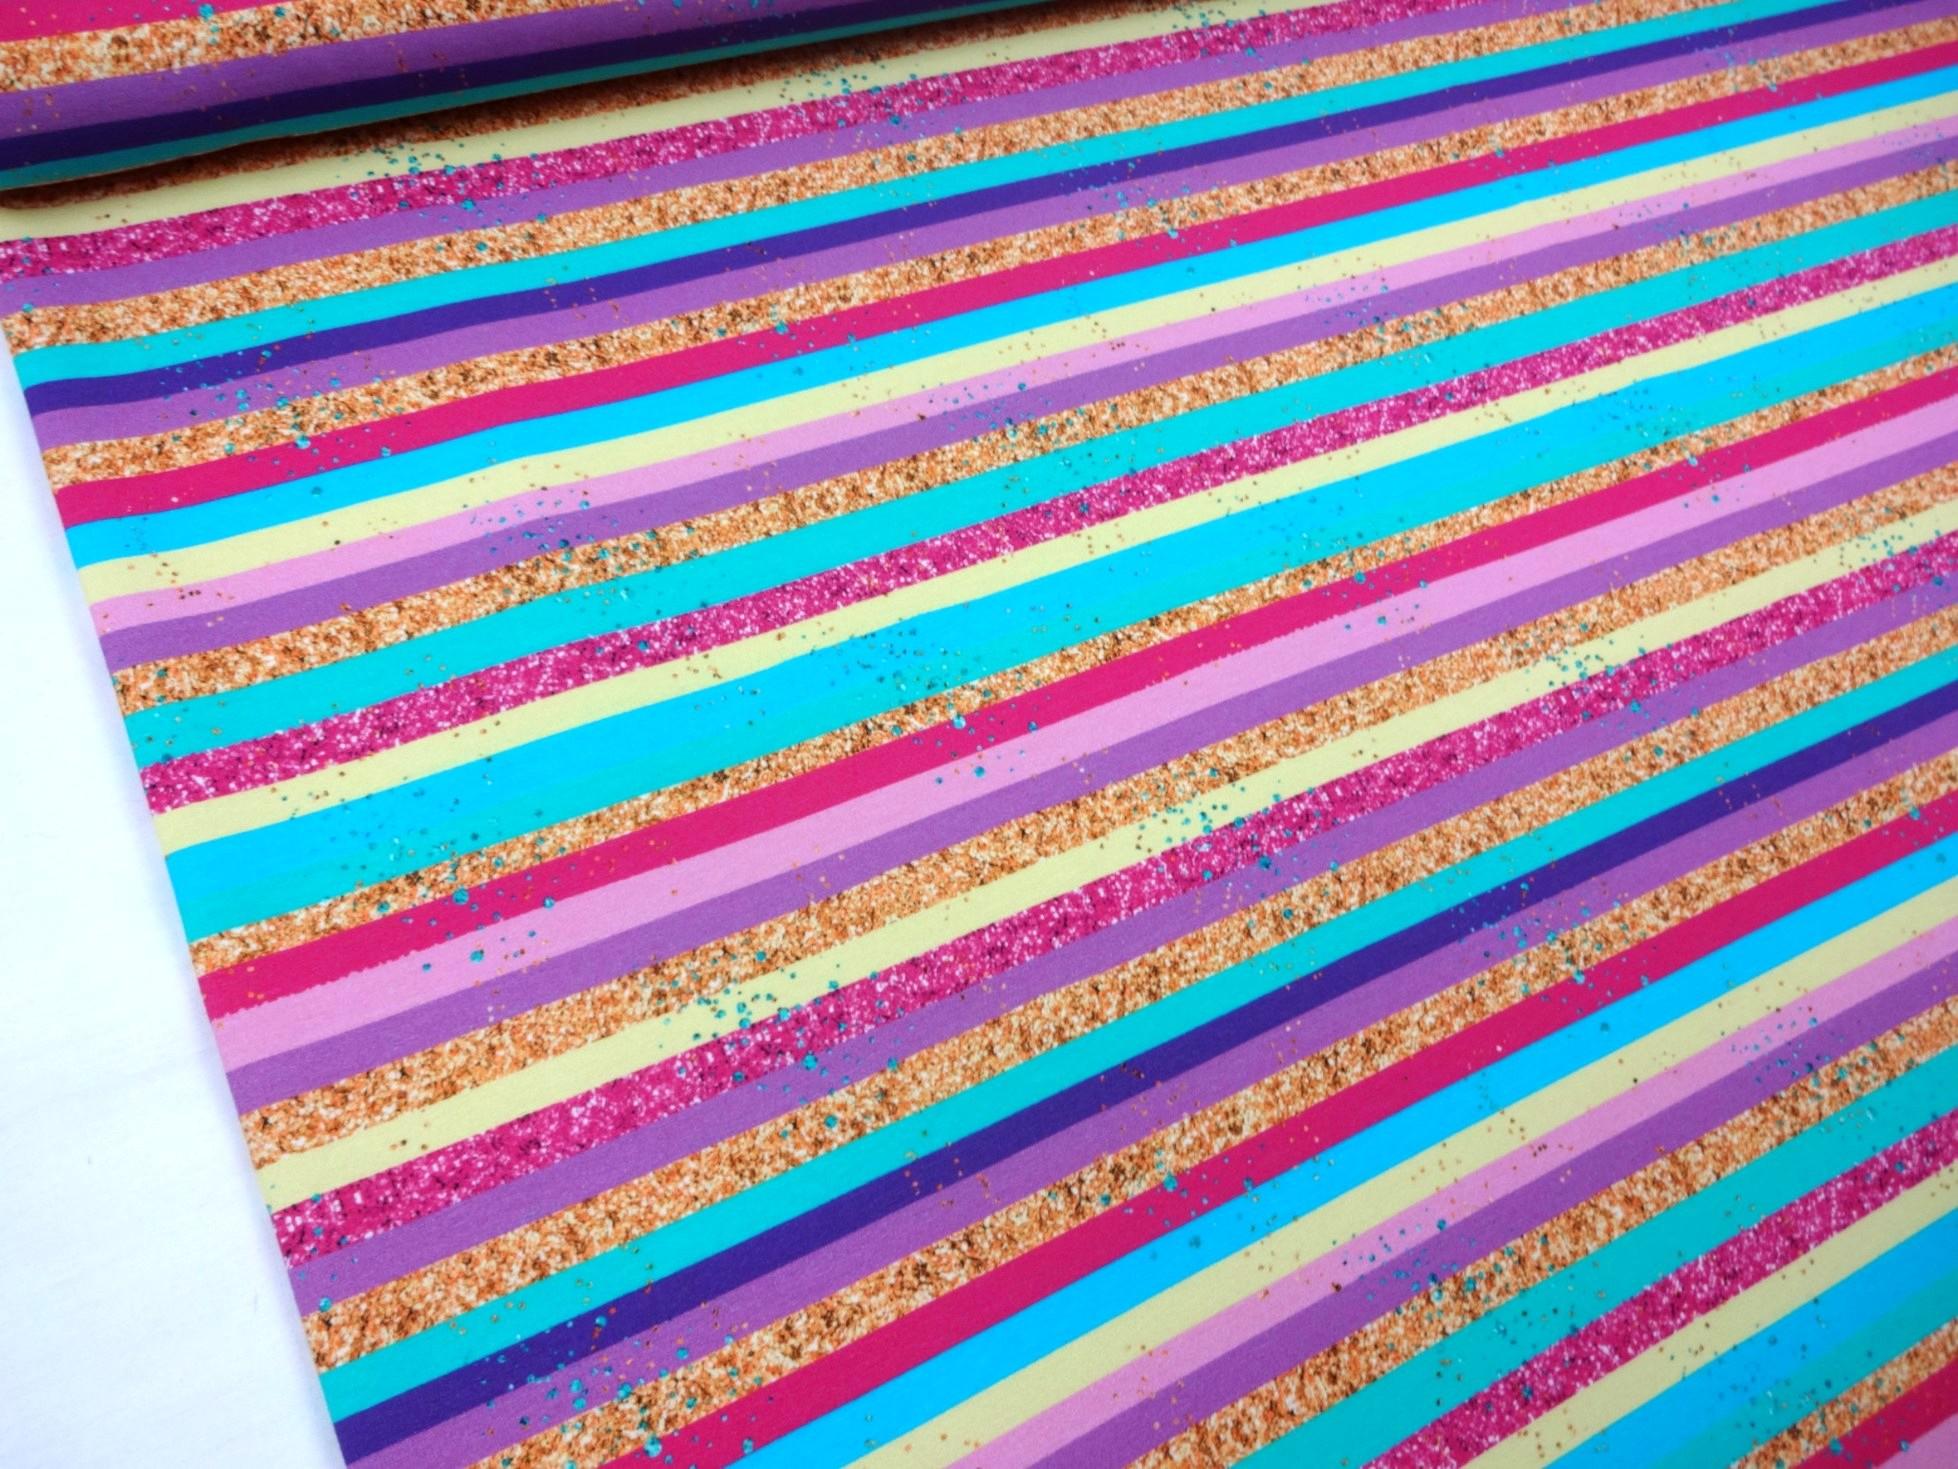 T5326 Sweatshirt Fabric Stripes neongold